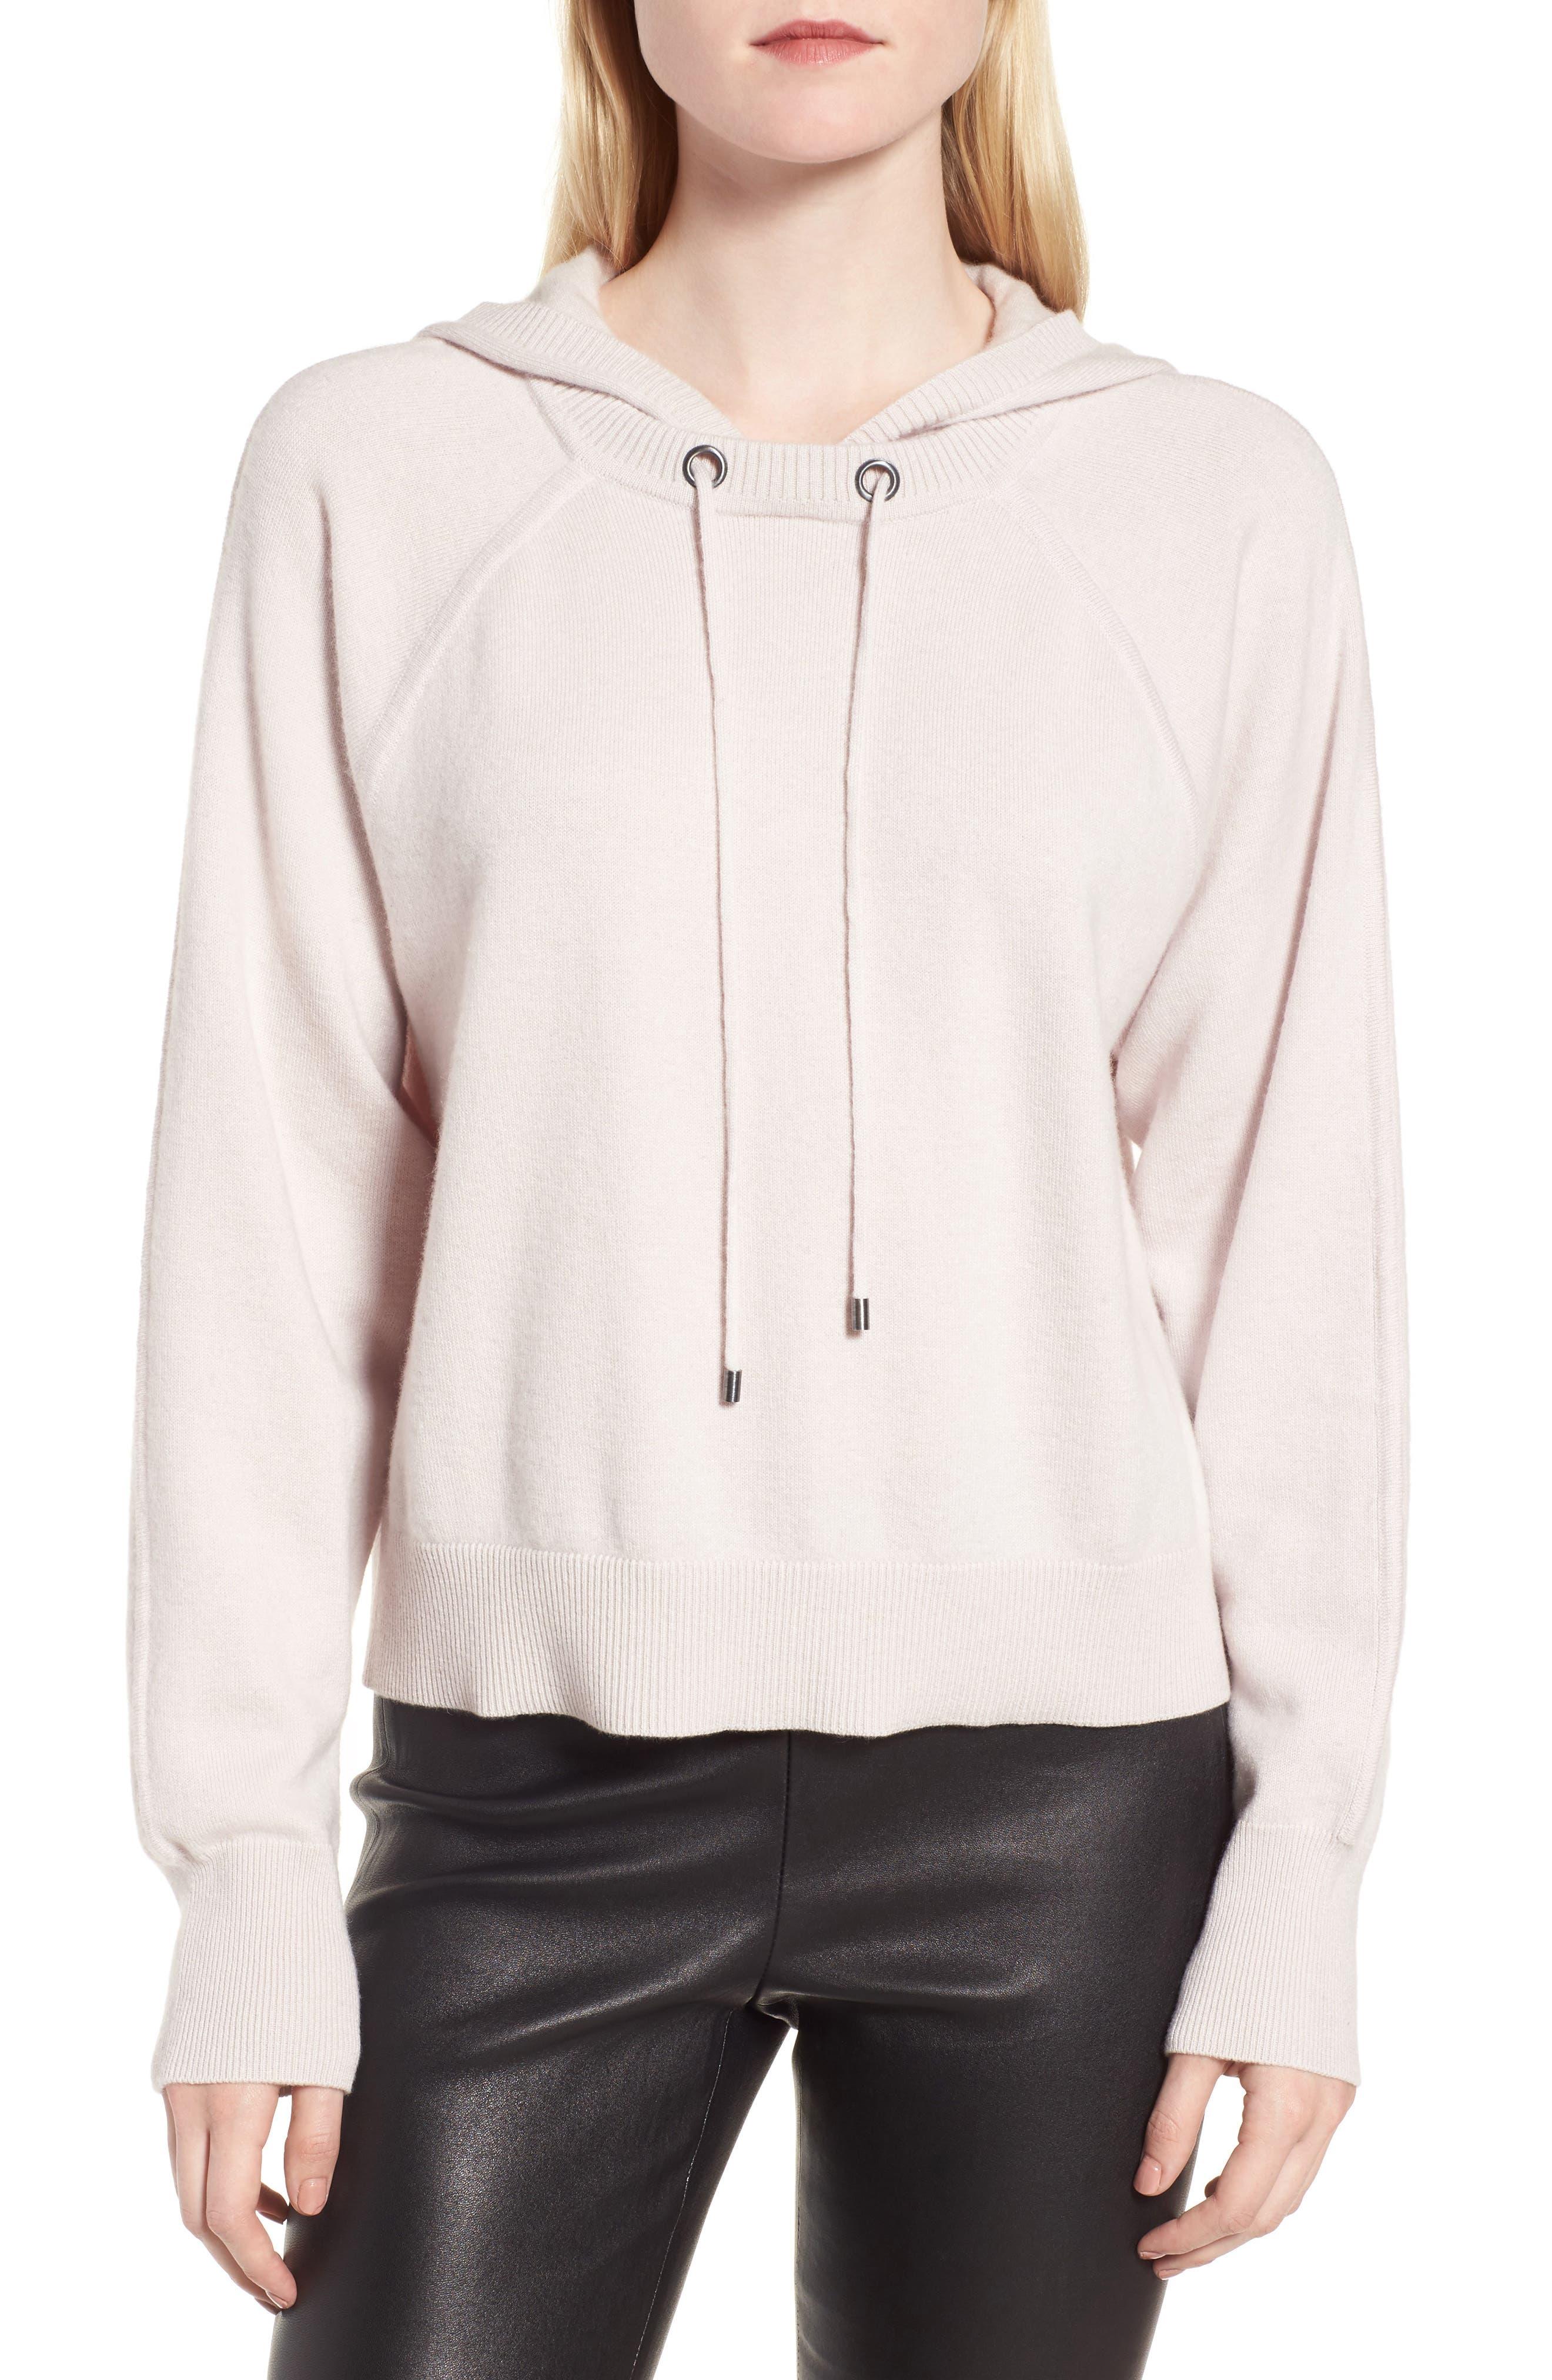 Main Image - Nordstrom Signature Cashmere-Blend Hoodie Sweatshirt